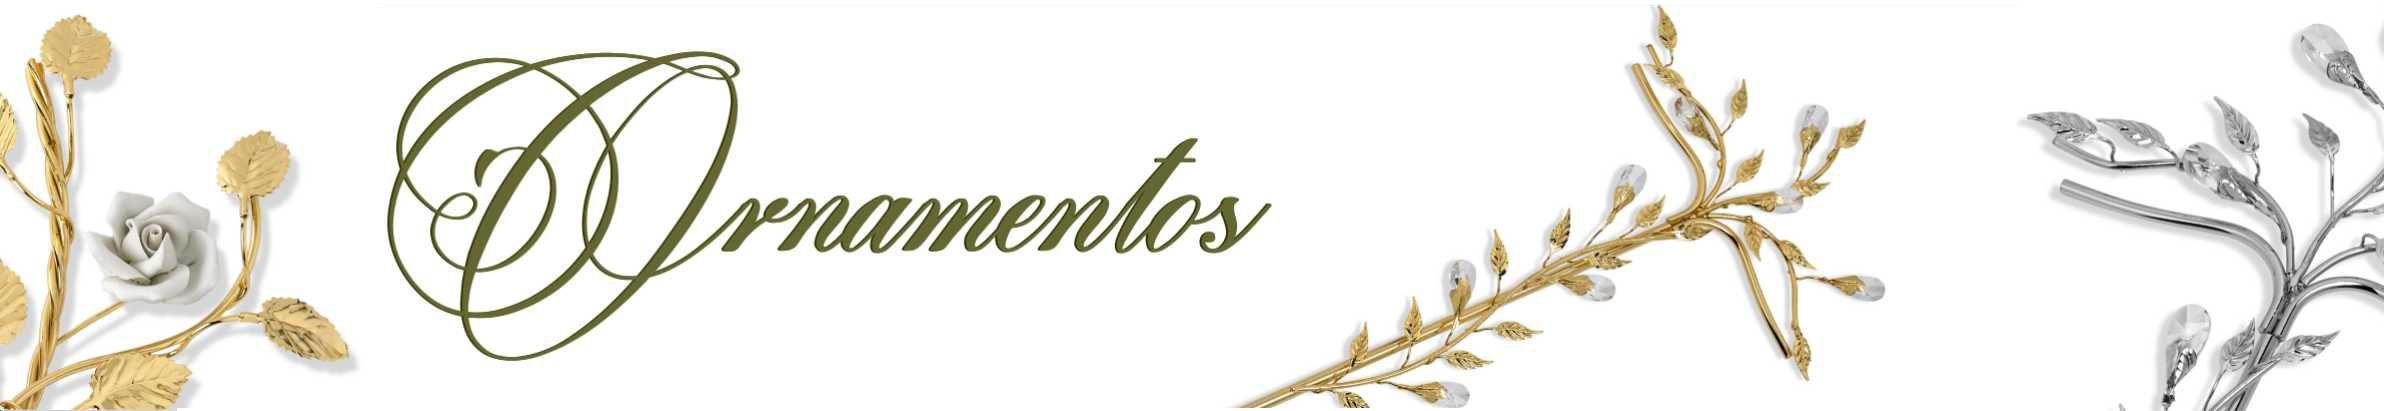 Banner-Ornamentos.jpg